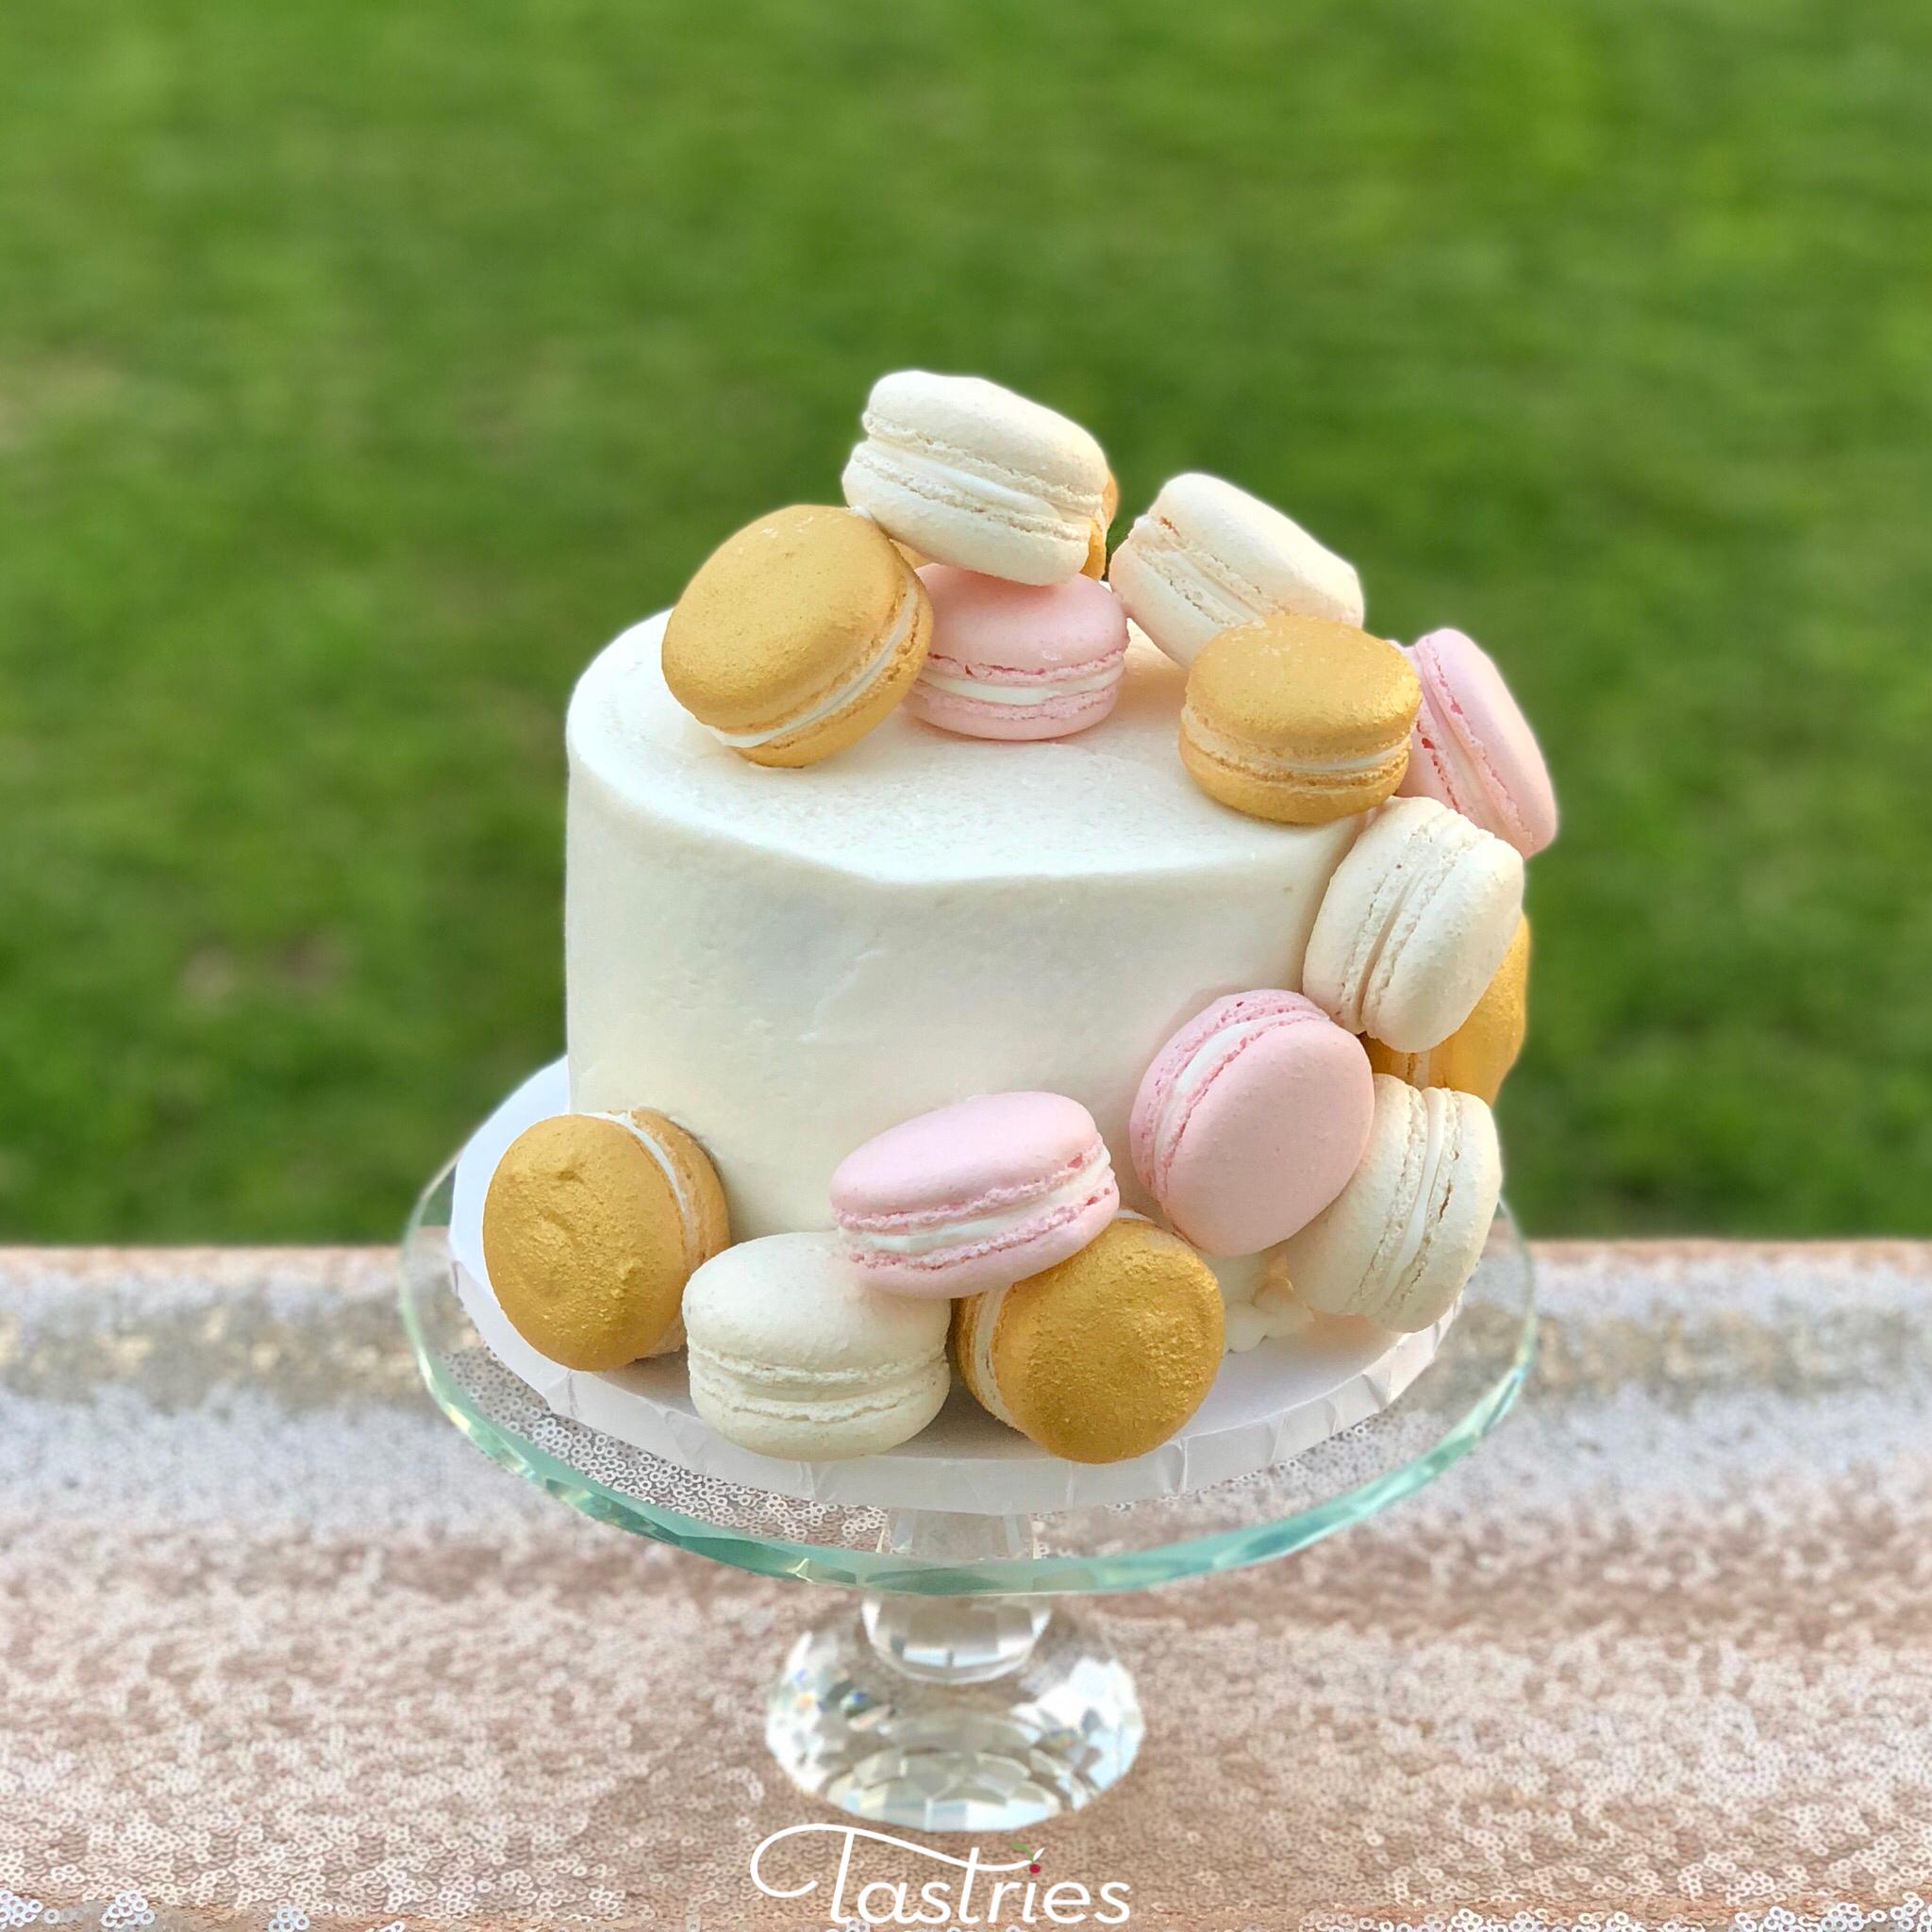 Macaron Dessert Cake, Tastries